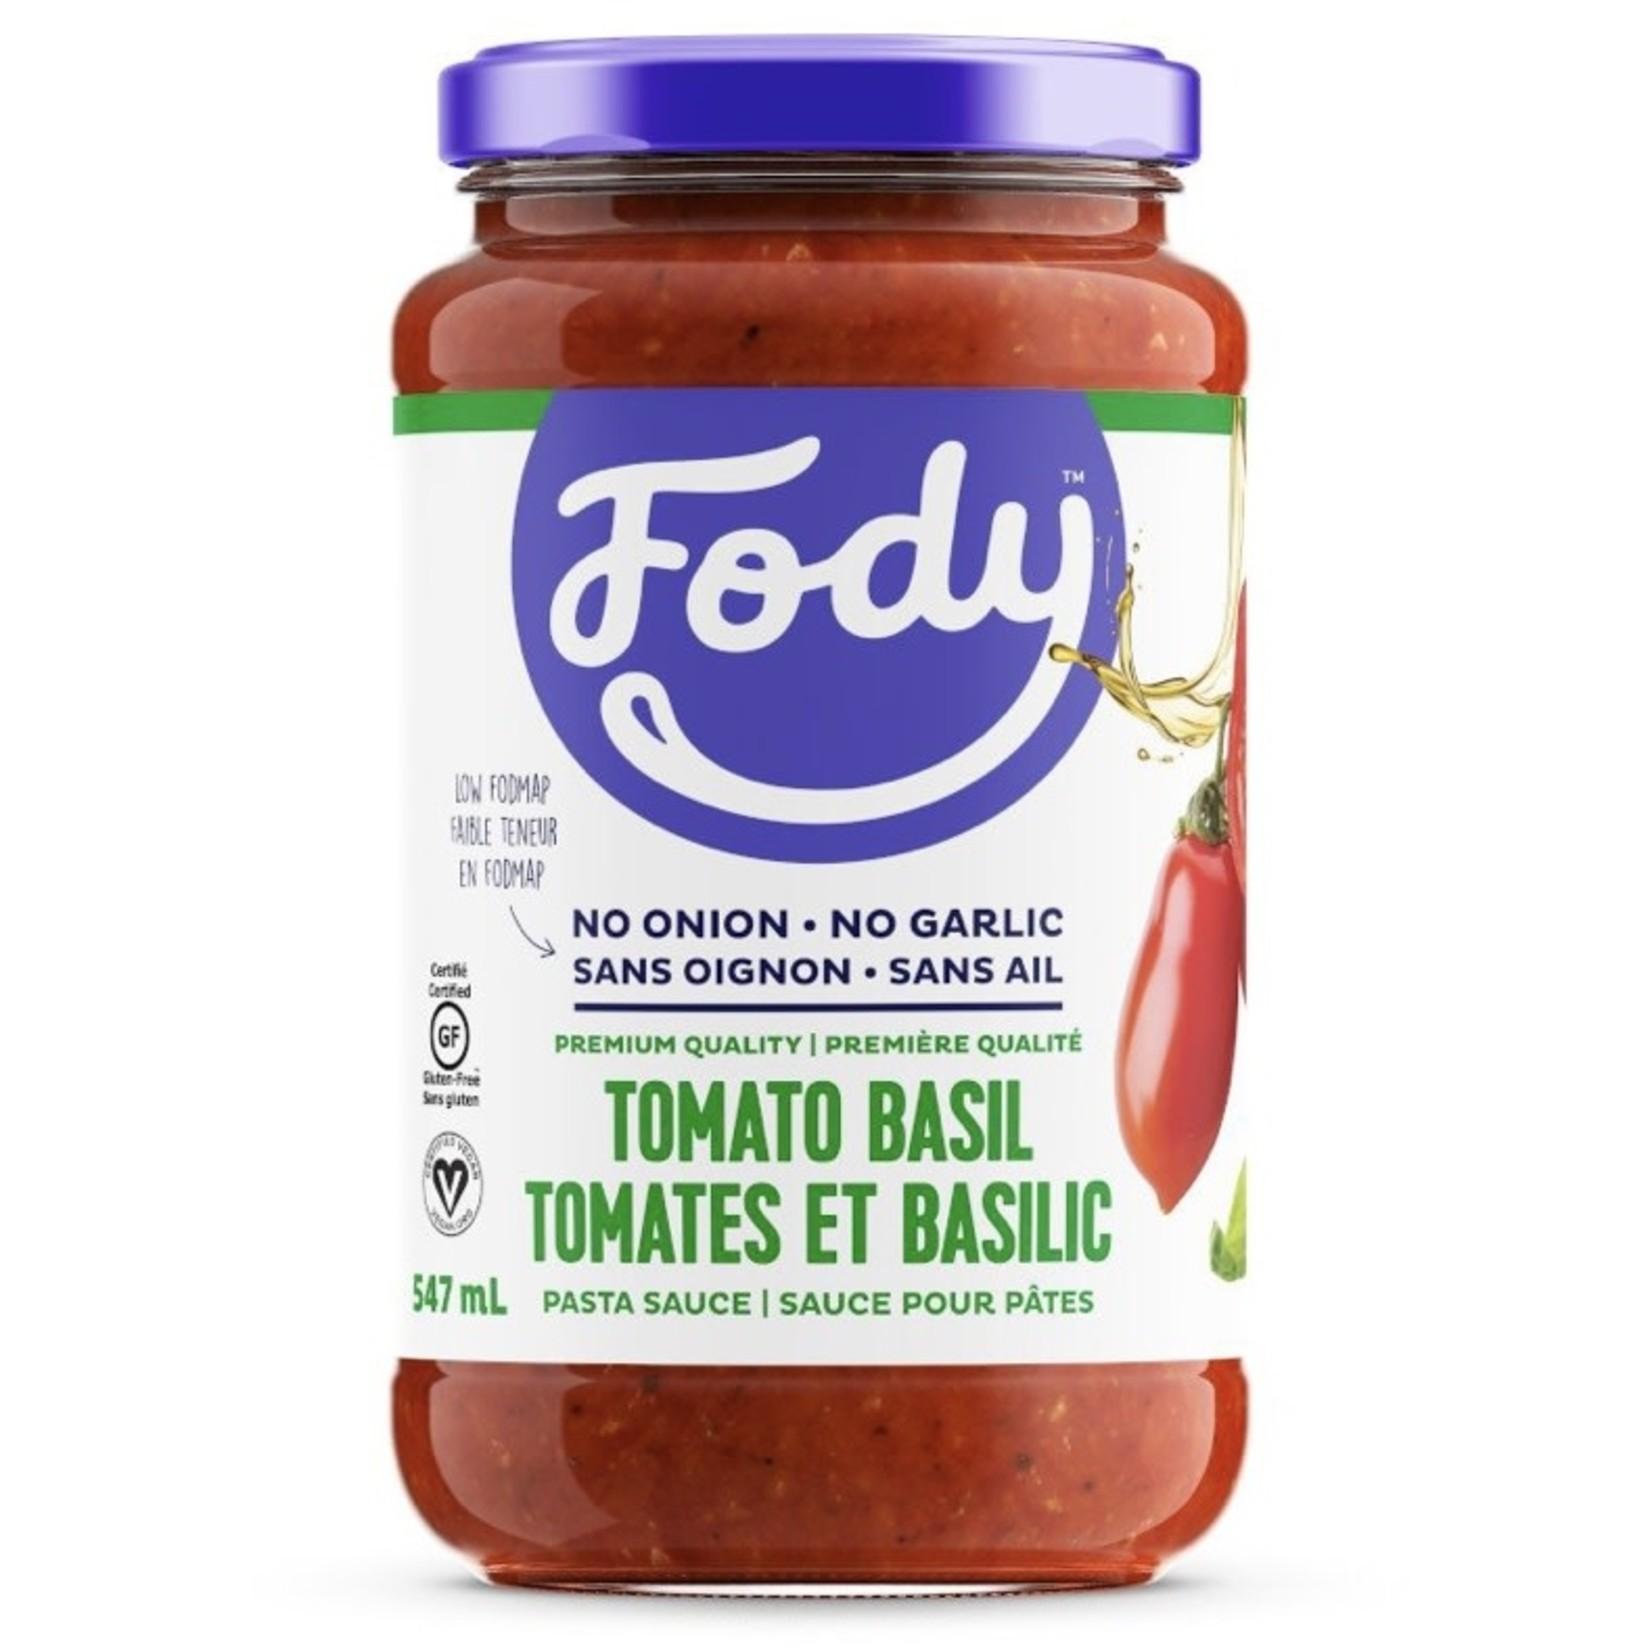 Fody Food Co. Fody Tomato Basil Pasta Sauce